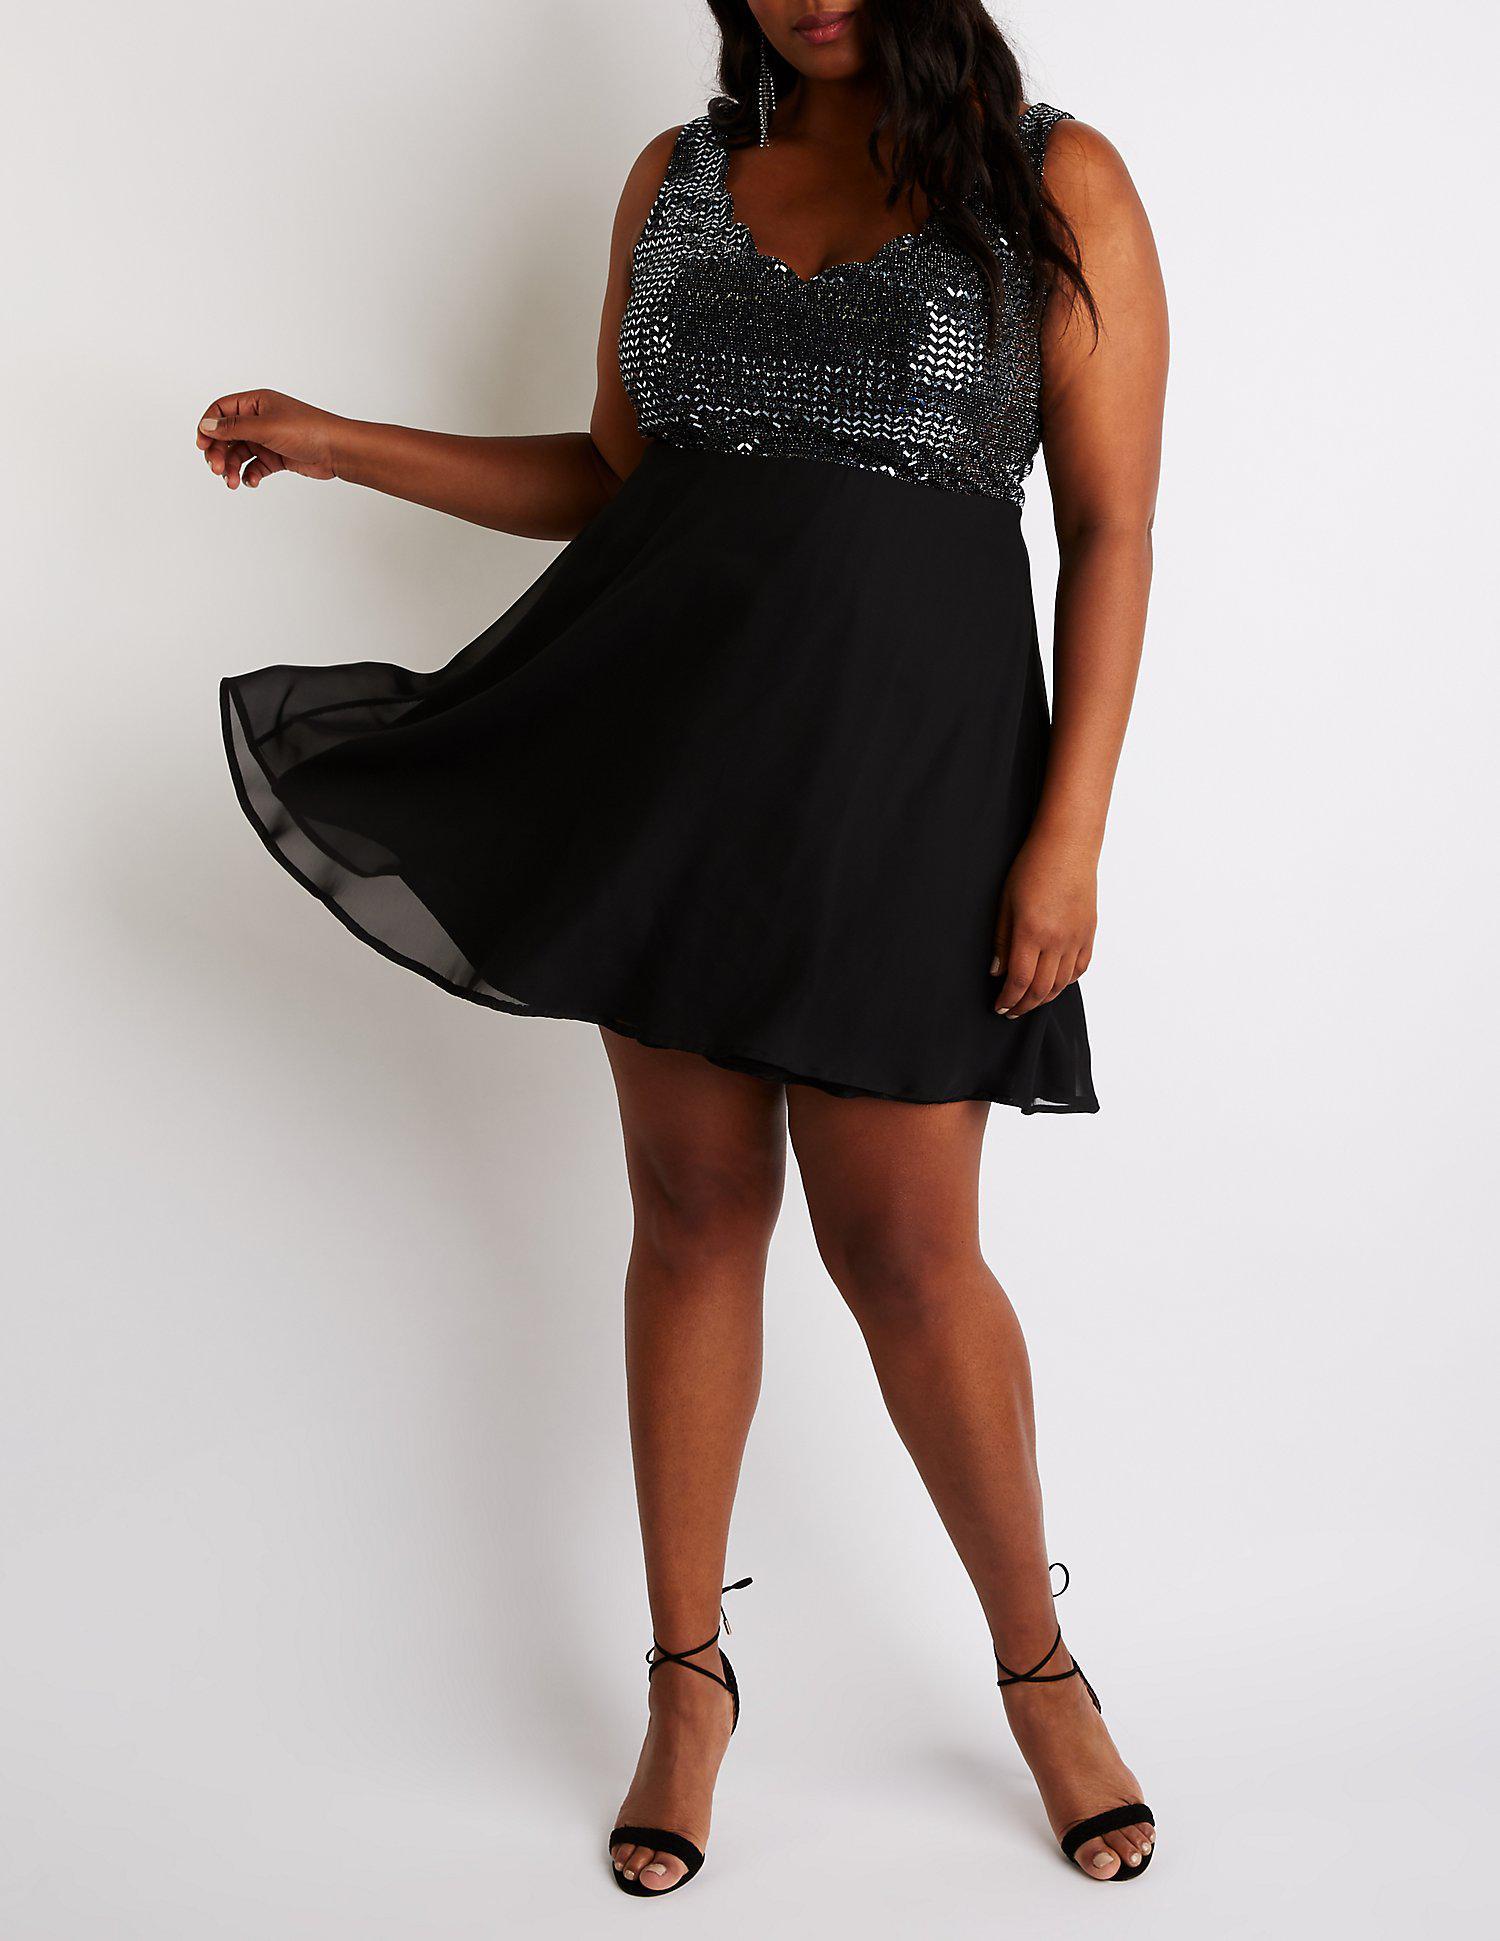 bfb67a300c6 Charlotte Russe - Black Plus Size Sequin Skater Dress - Lyst. View  fullscreen